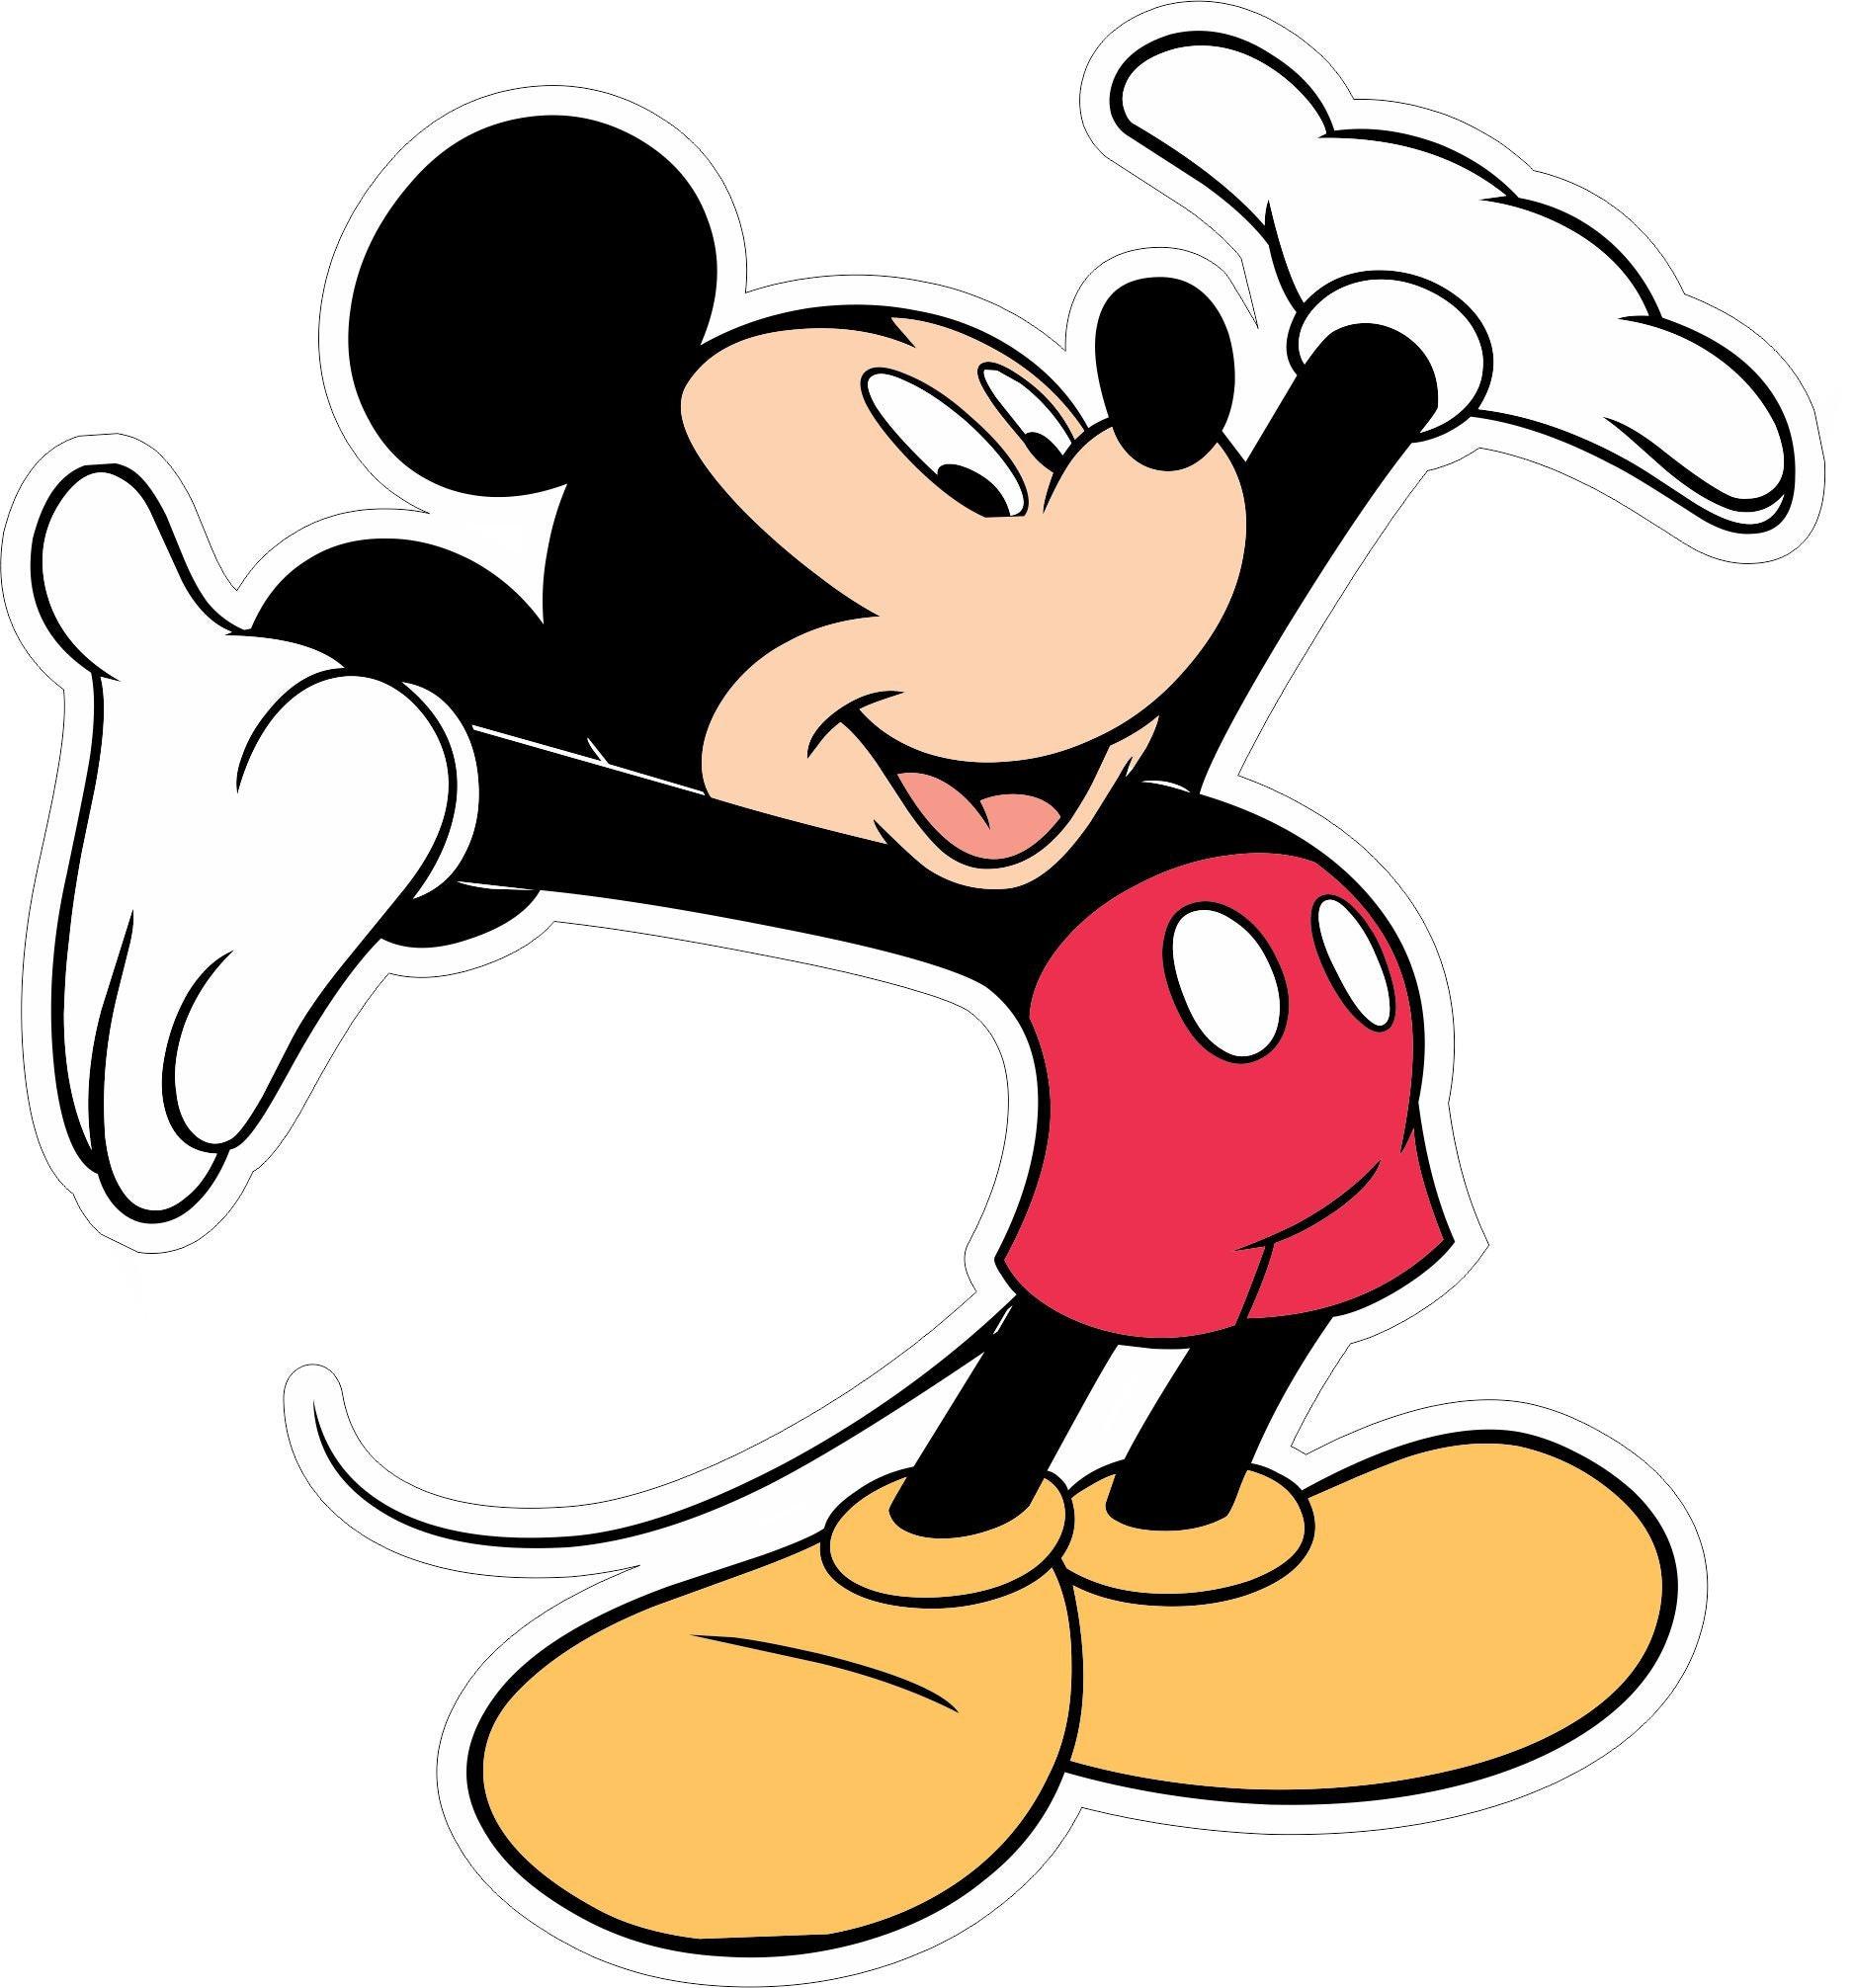 3c6bc02d4c400 Mickey Mouse 003 - Vinyl Sticker Decal - Full Color Cad Cut - Disney